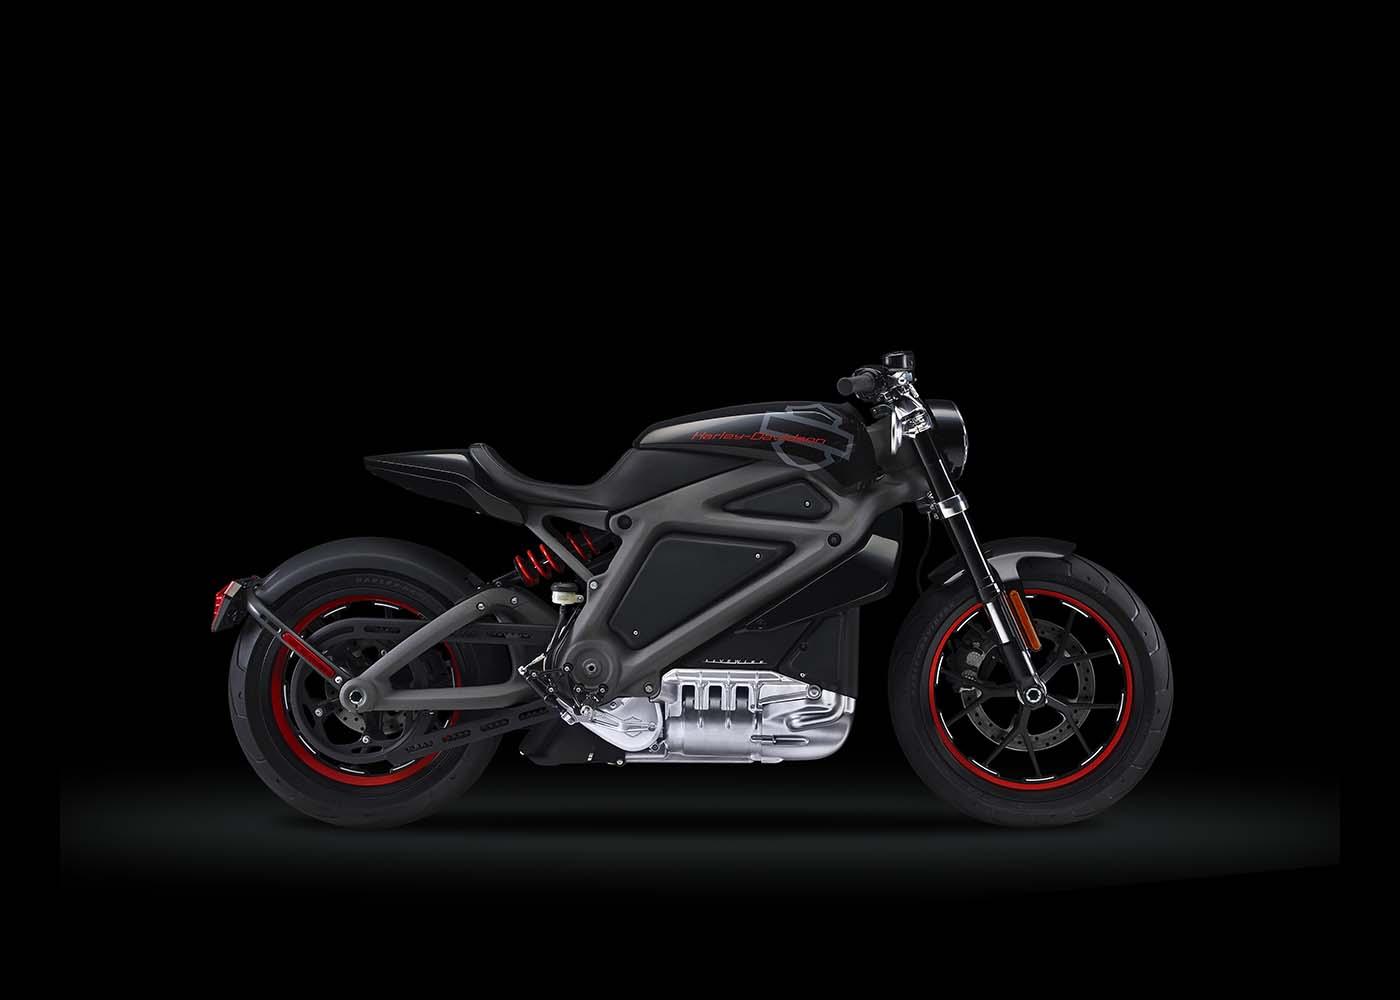 La sportive verte du futur - Page 15 Harley-Davidson-Livewire-electric-motorcycle-08